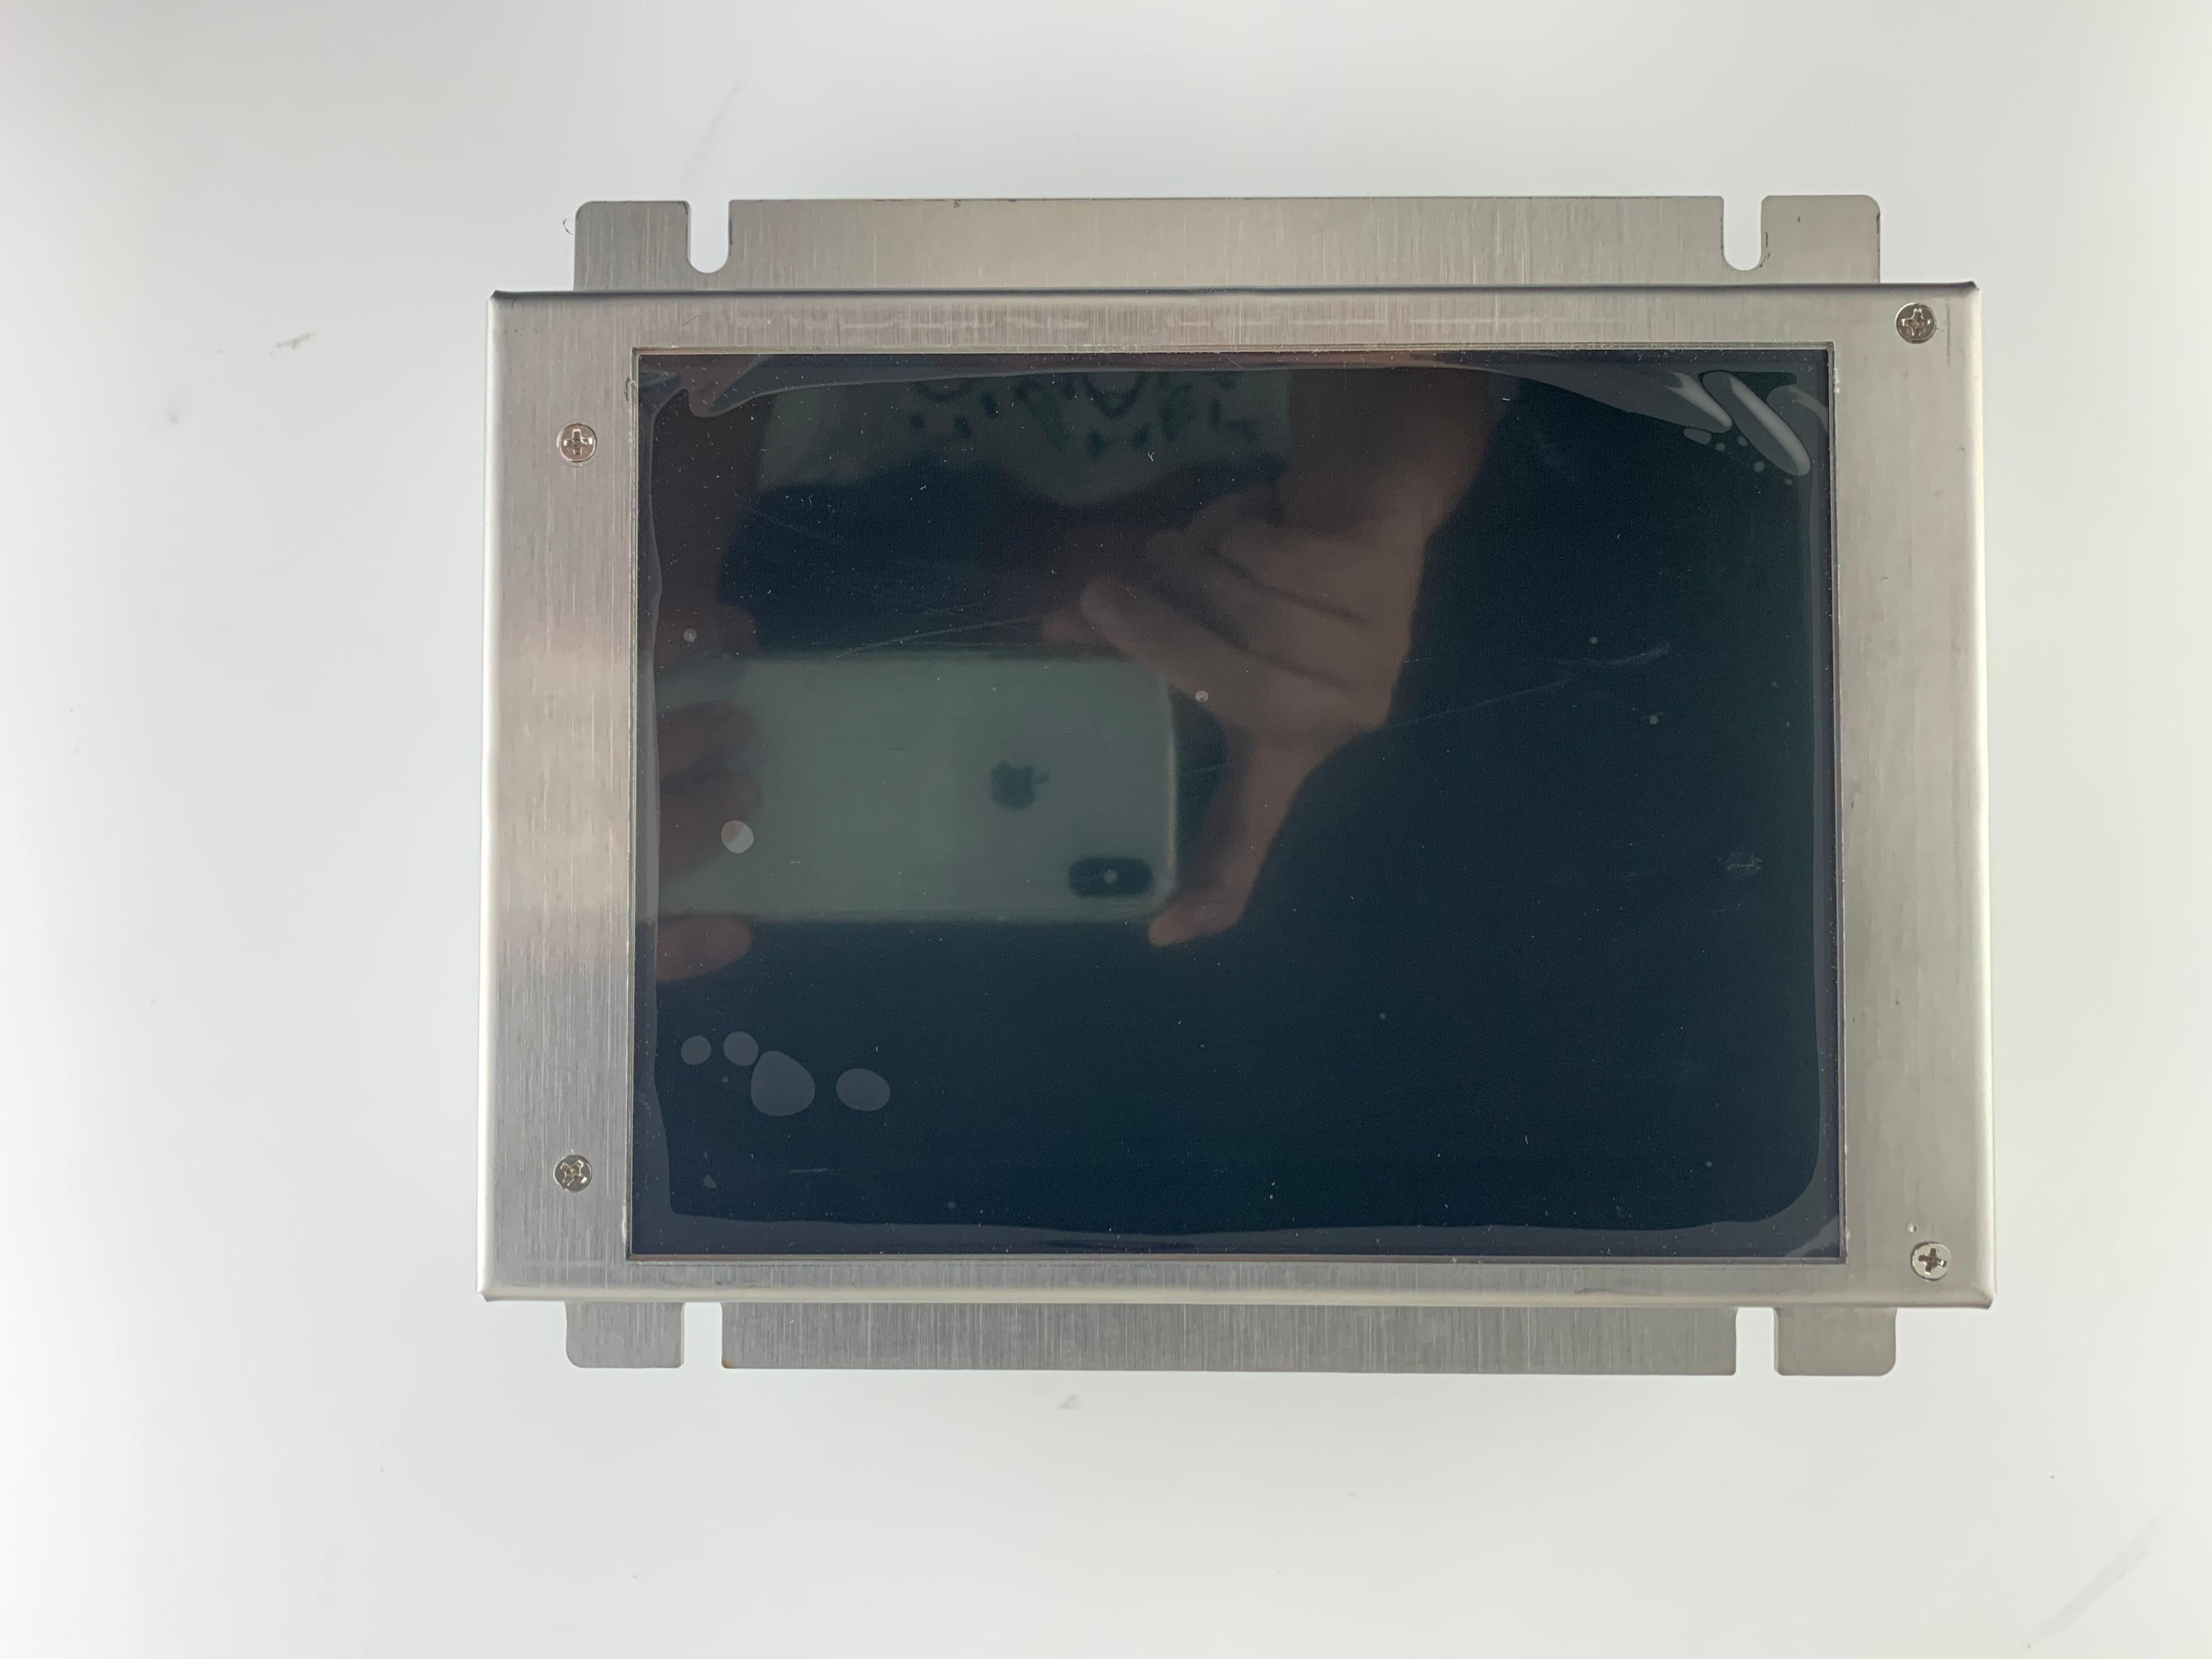 A61L-0001-0072 متوافق LCD عرض 9 بوصة ل CNC آلة استبدال CRT رصد ، دينا في المخزون